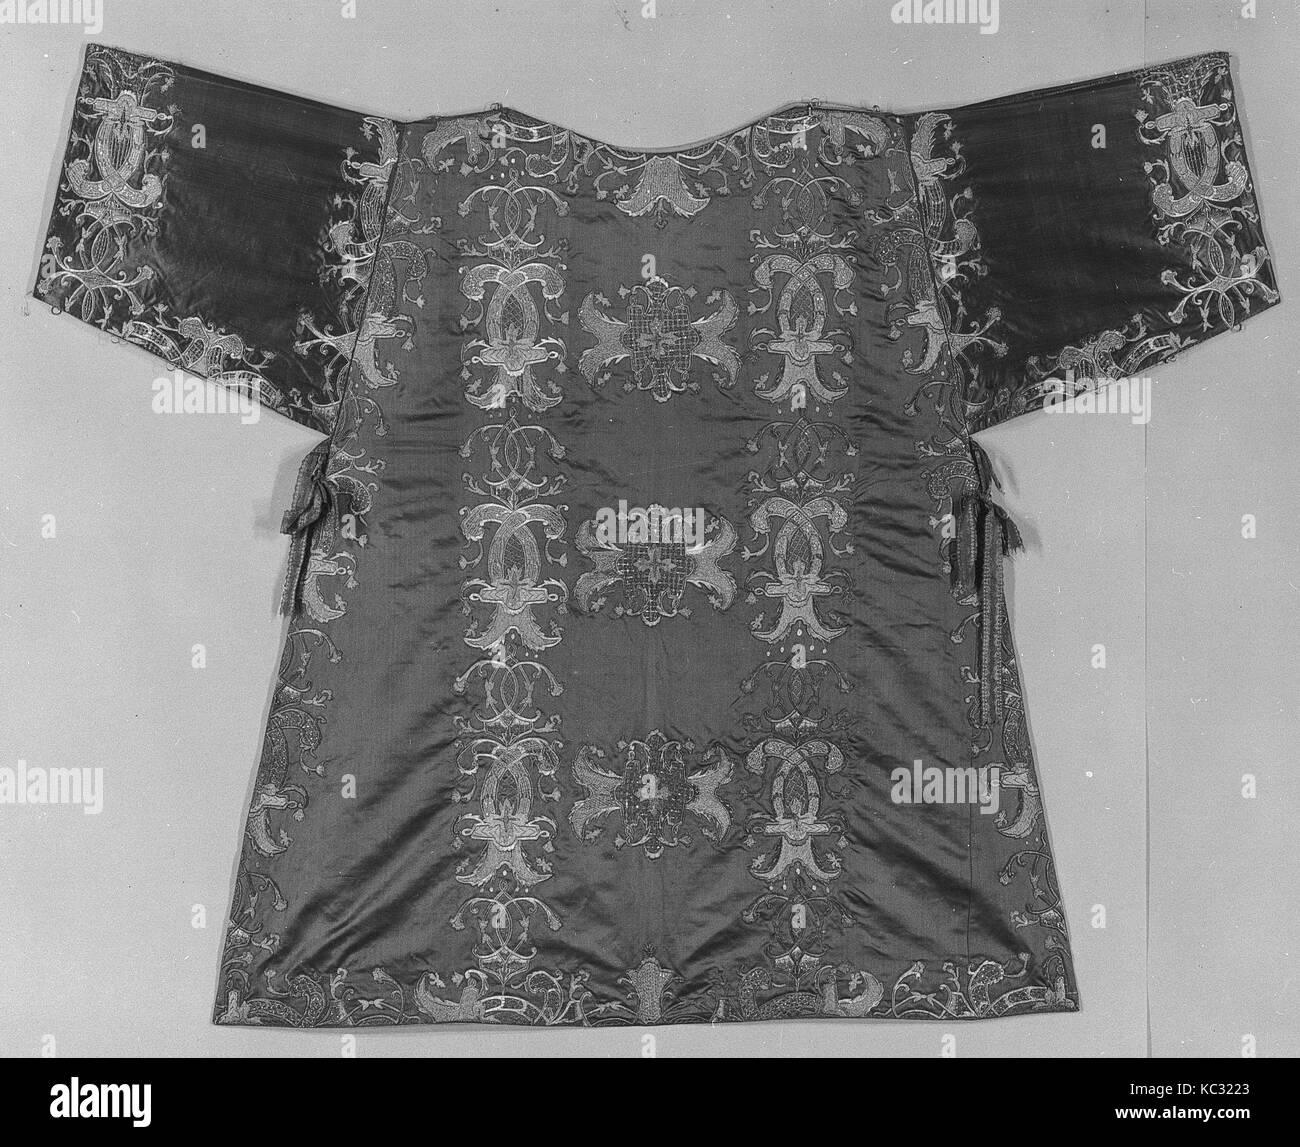 Dalmatic Stockfotos & Dalmatic Bilder - Alamy